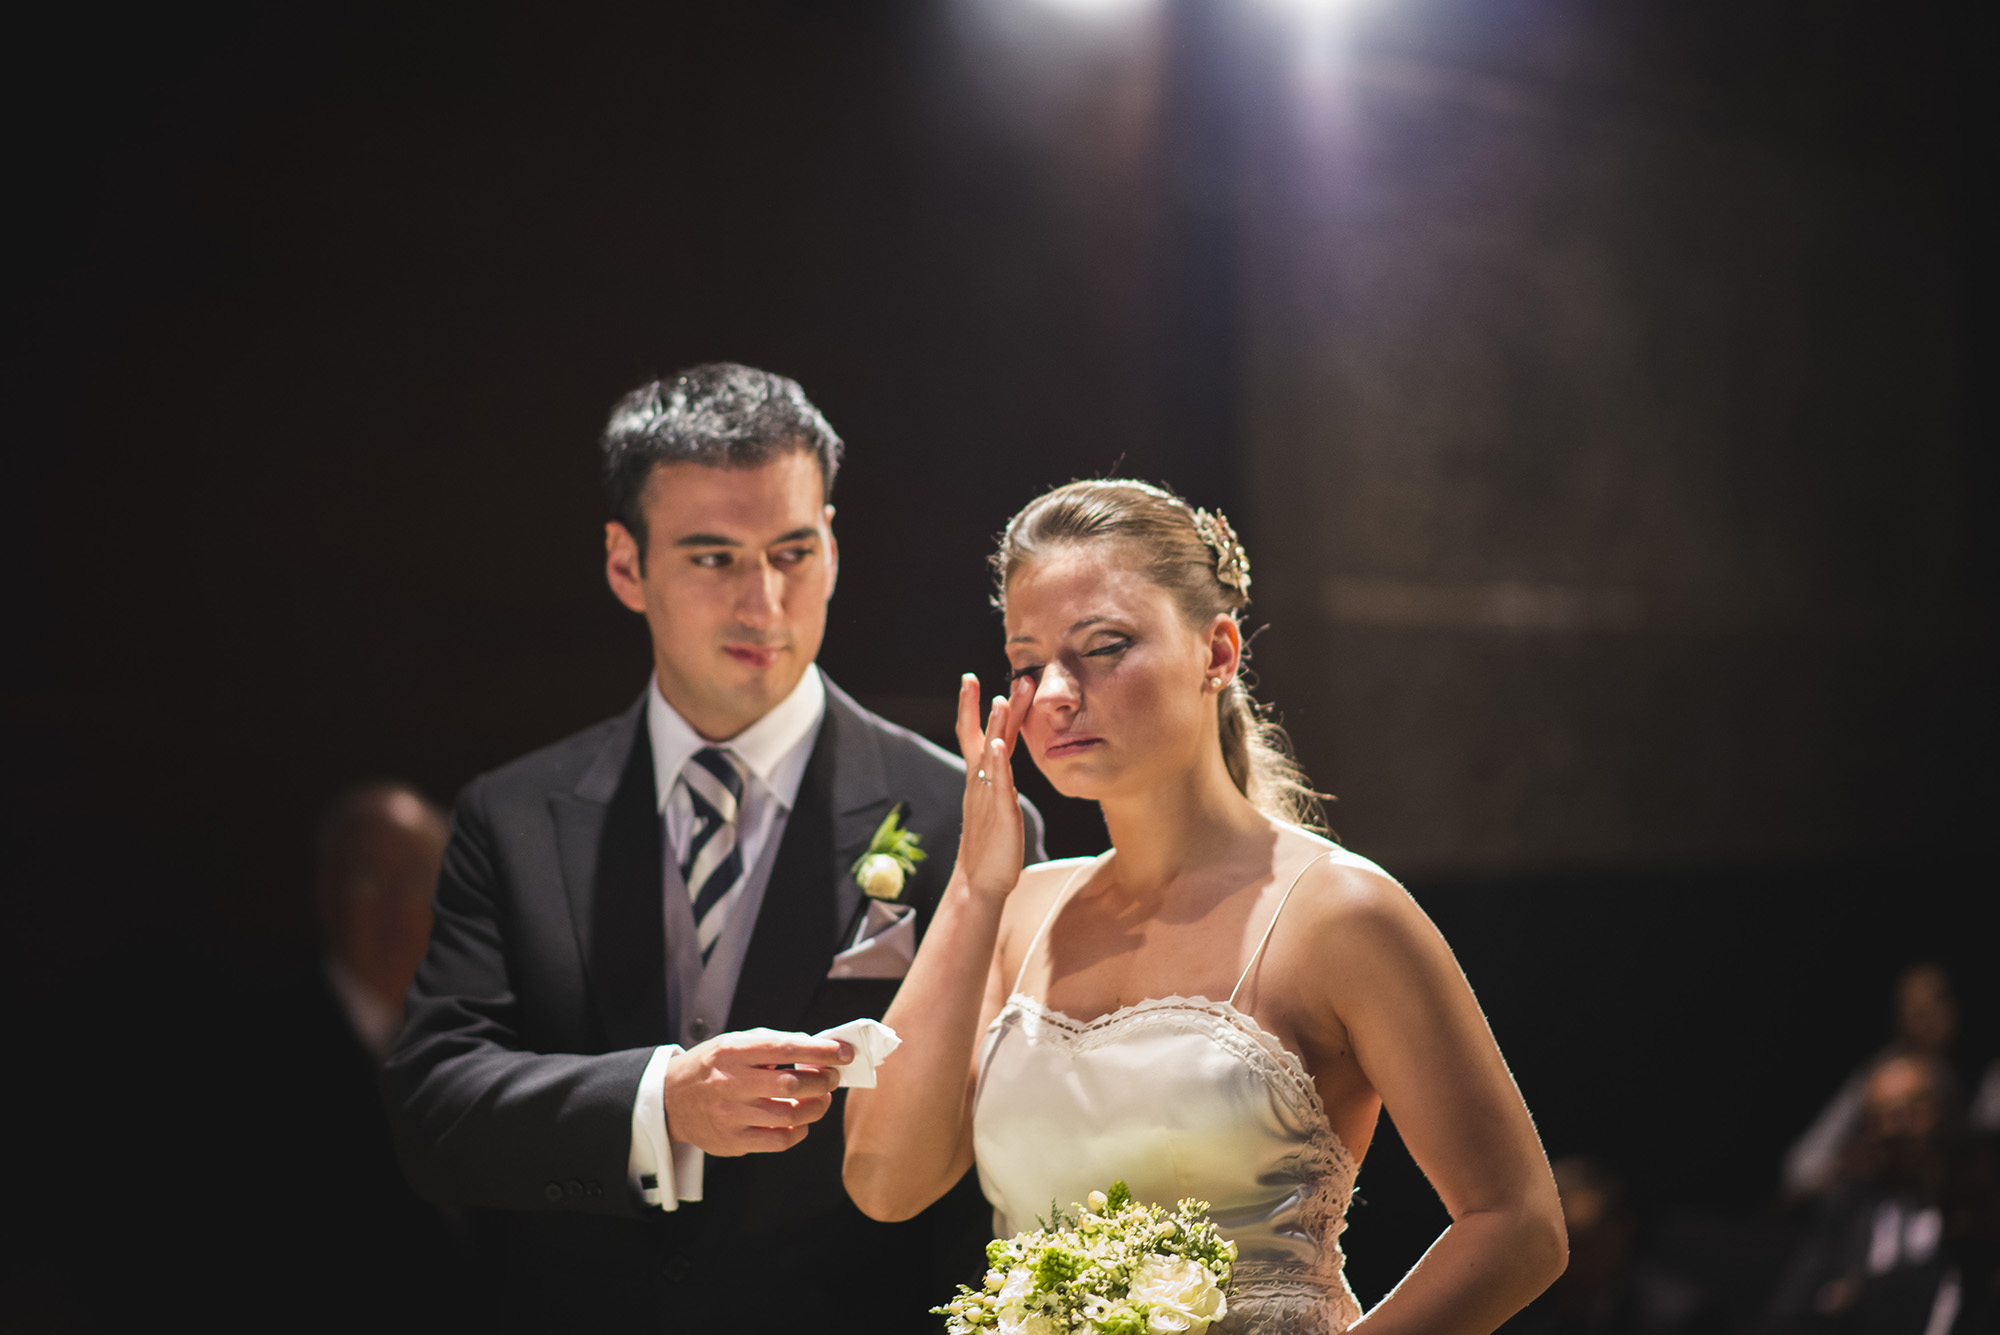 patricia-riba-casamiento-montevideo-uruguay-lindolfo-38